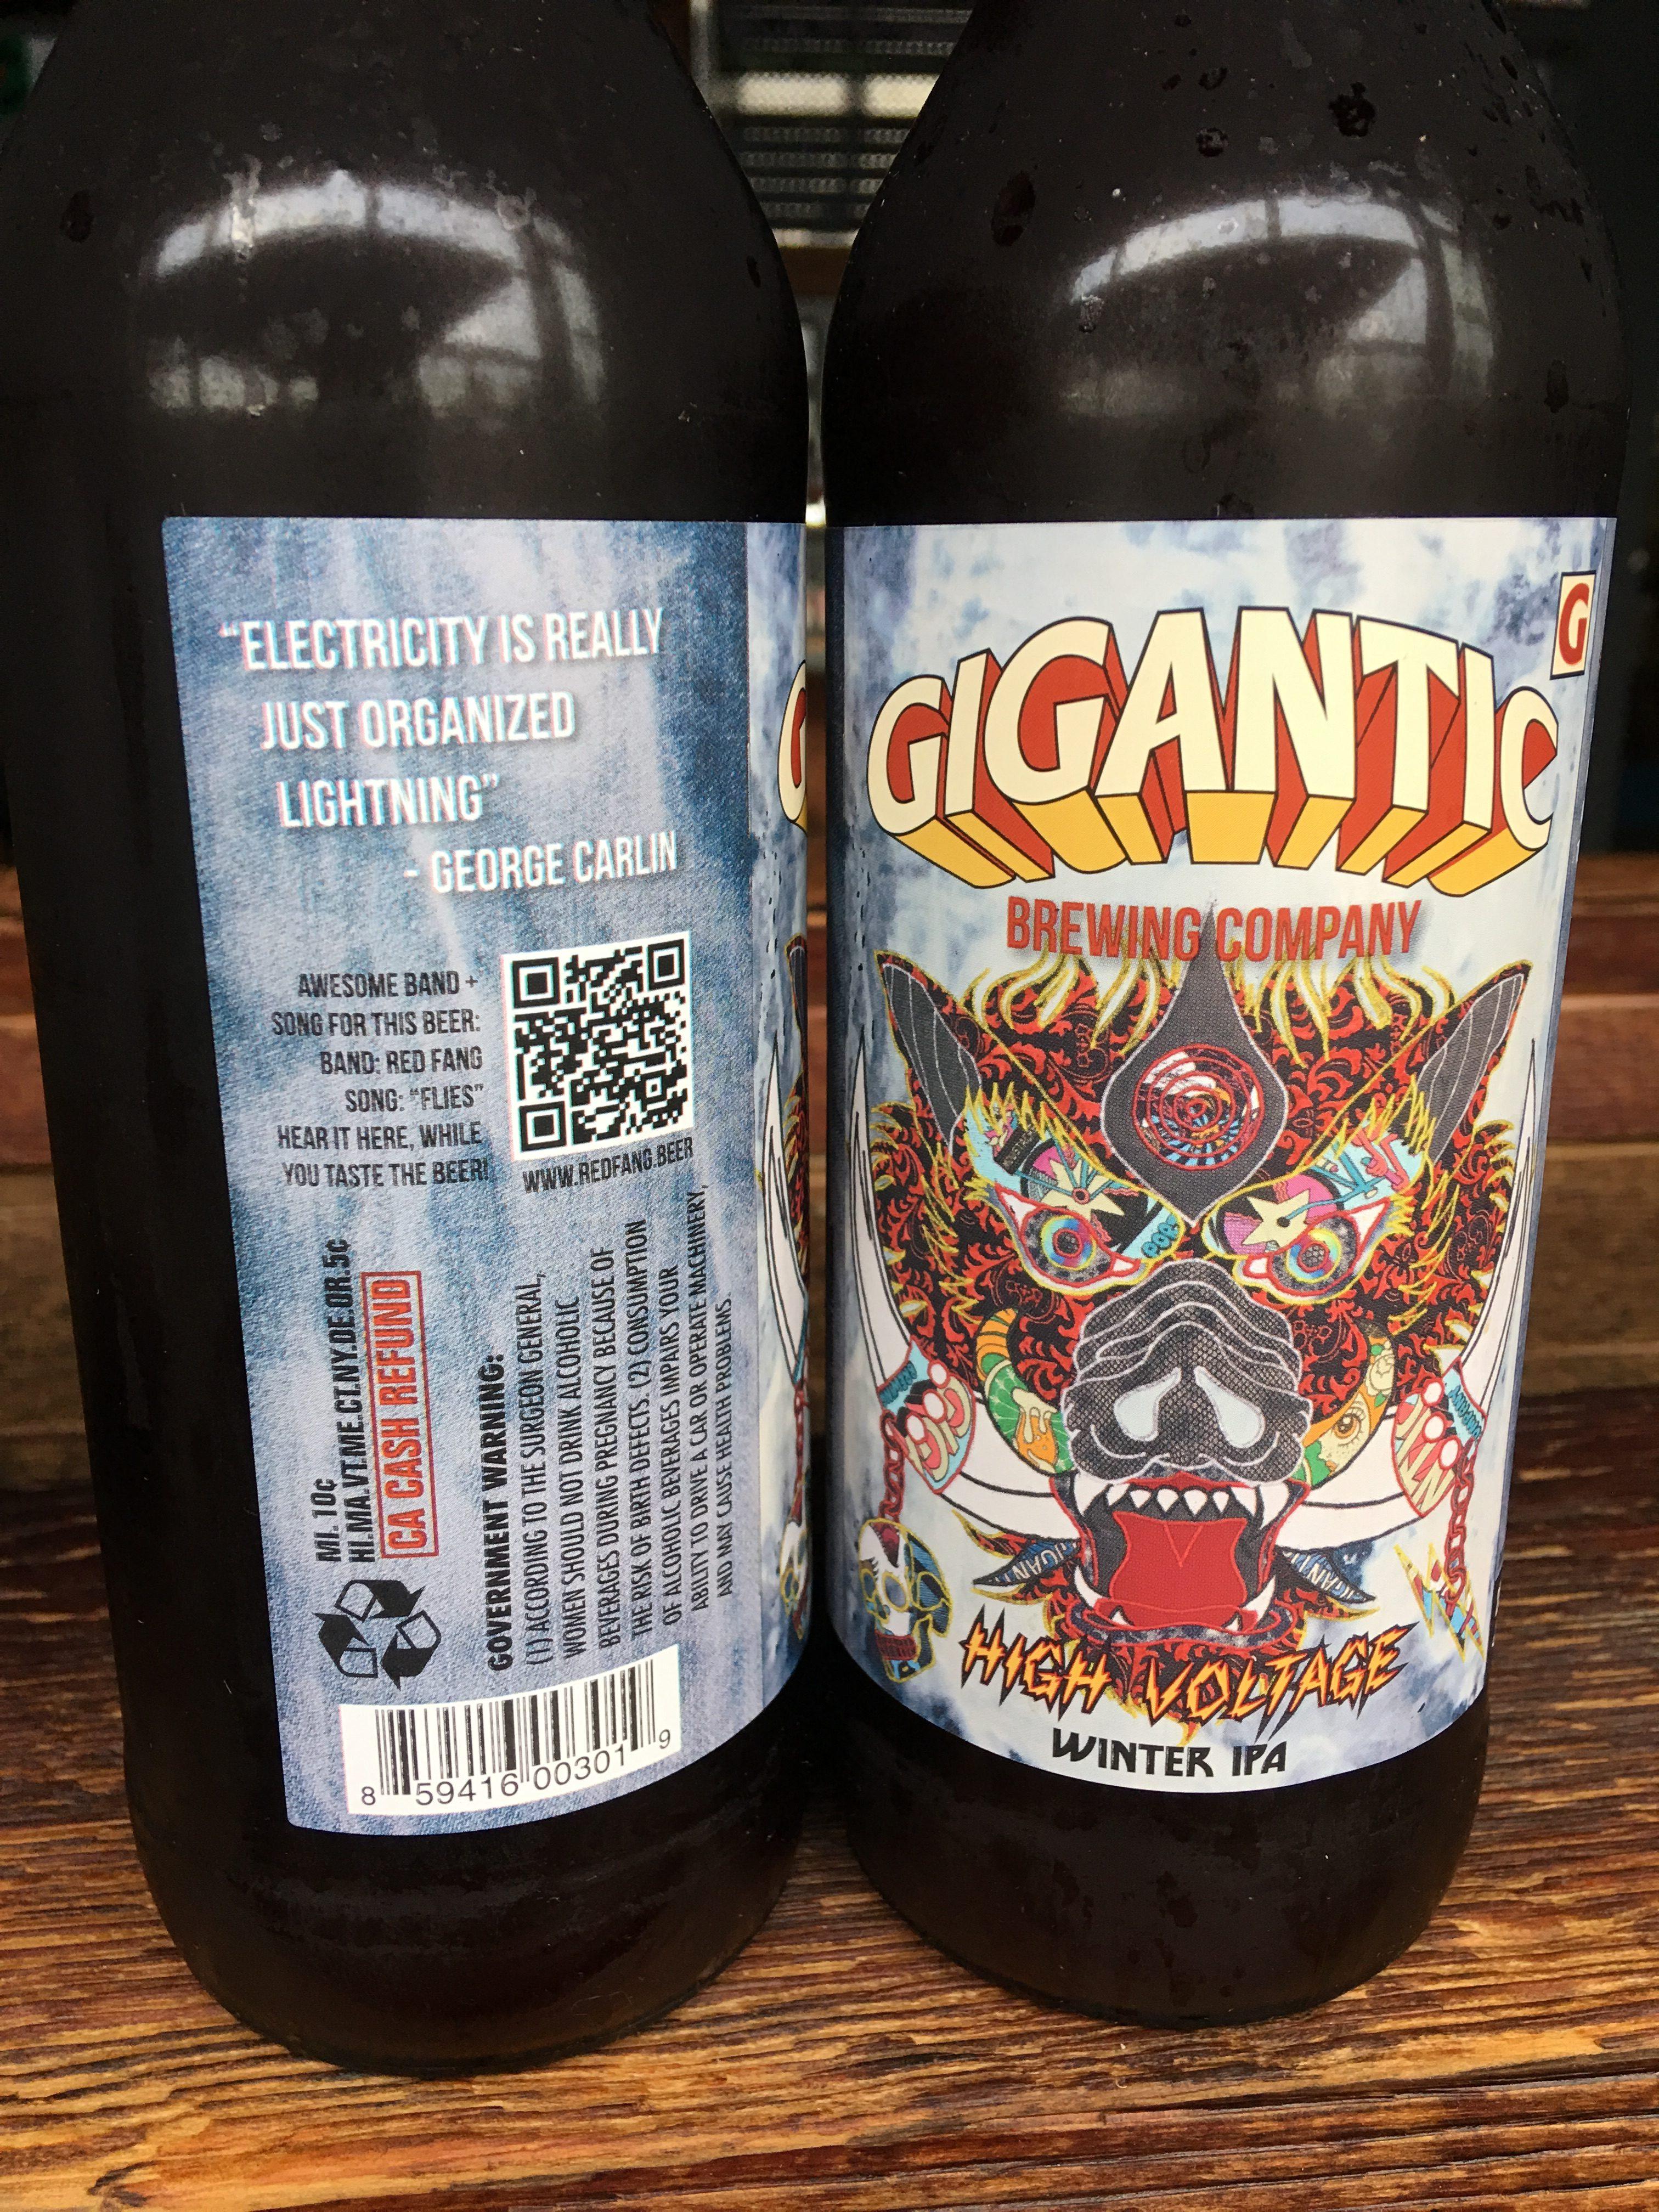 Bottles of Gigantic High Voltage Winter IPA. (image courtesy of Gigantic Brewing)